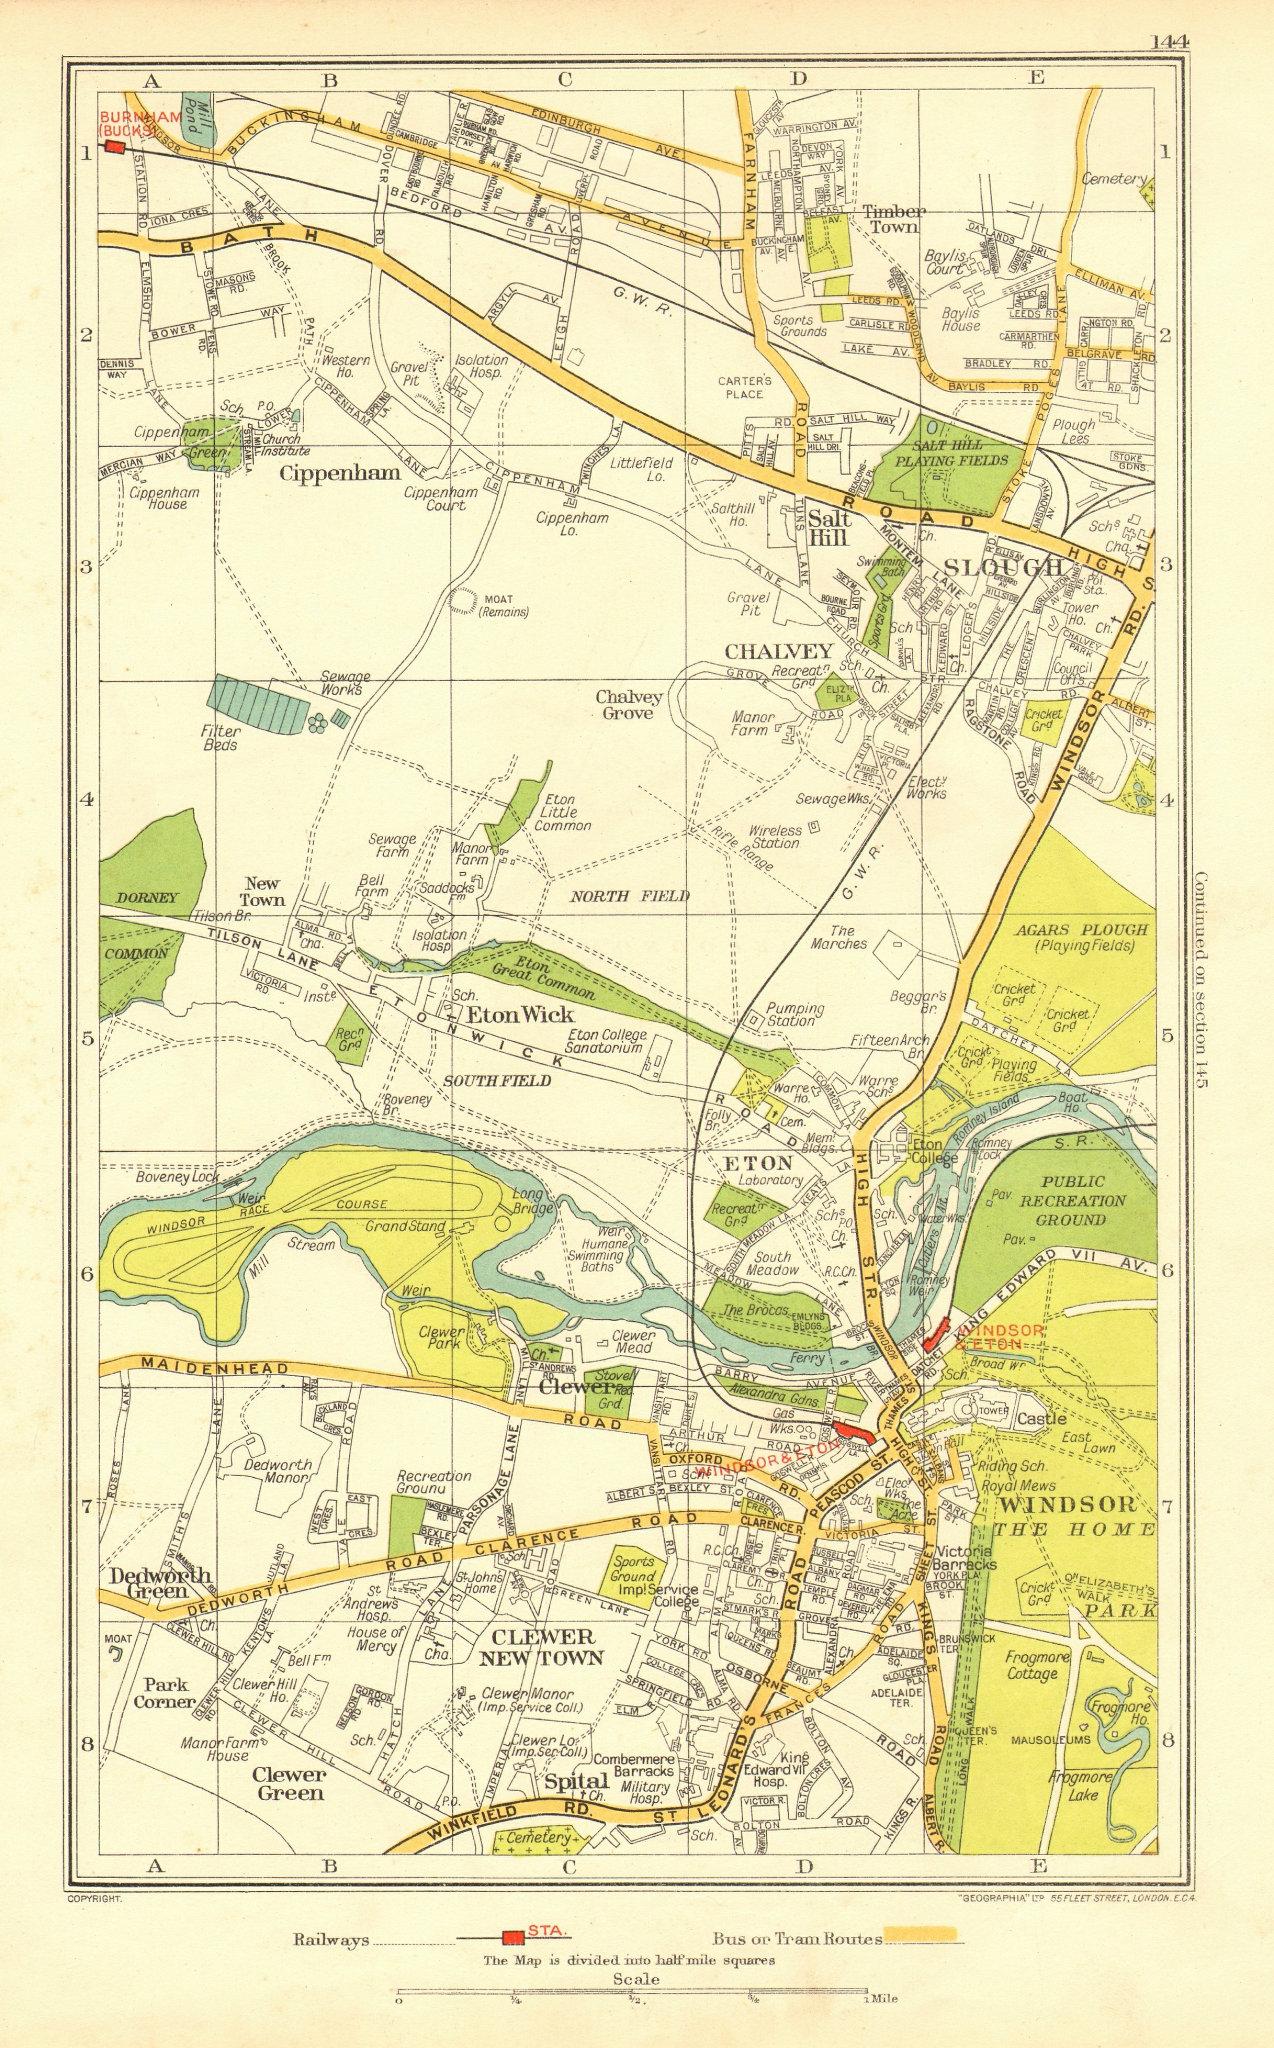 Associate Product WINDSOR ETON SLOUGH. Clewer Dedworth Chalvey Cippenham Eton Wick 1937 old map